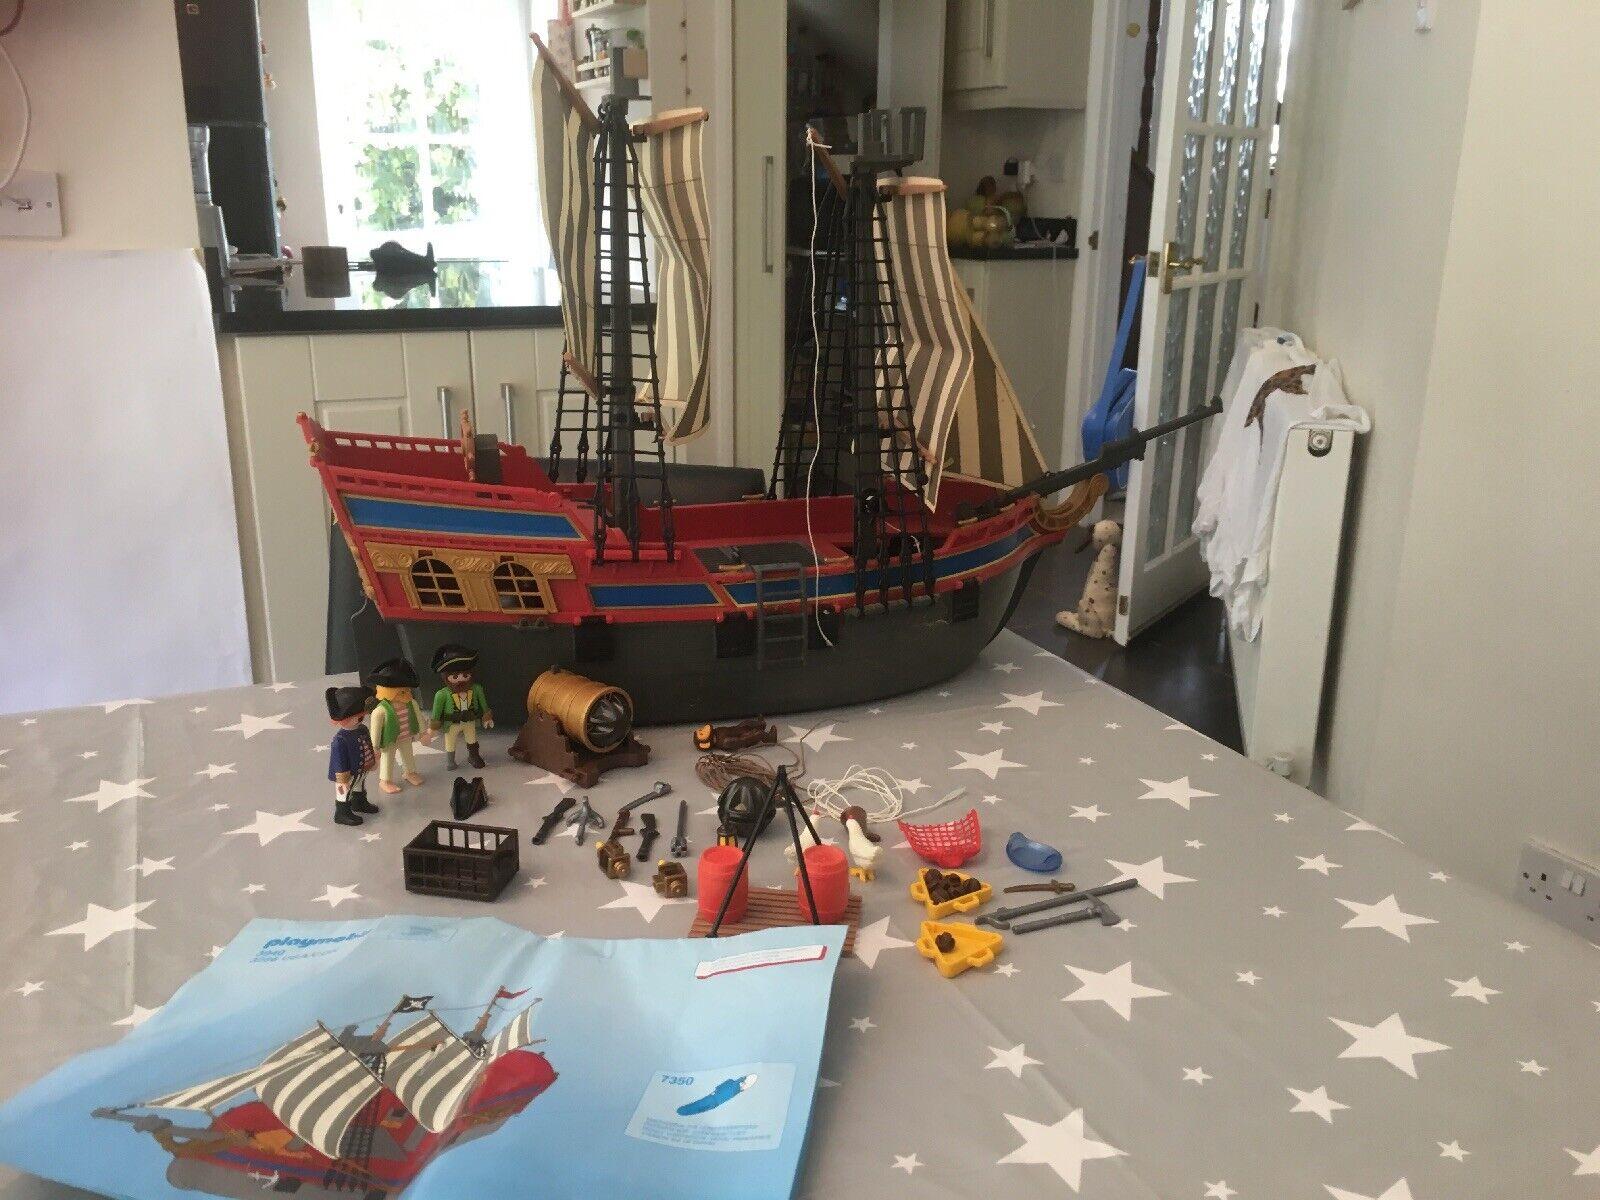 PLAYMOBIL gree nave pirata (3940)   vendite online